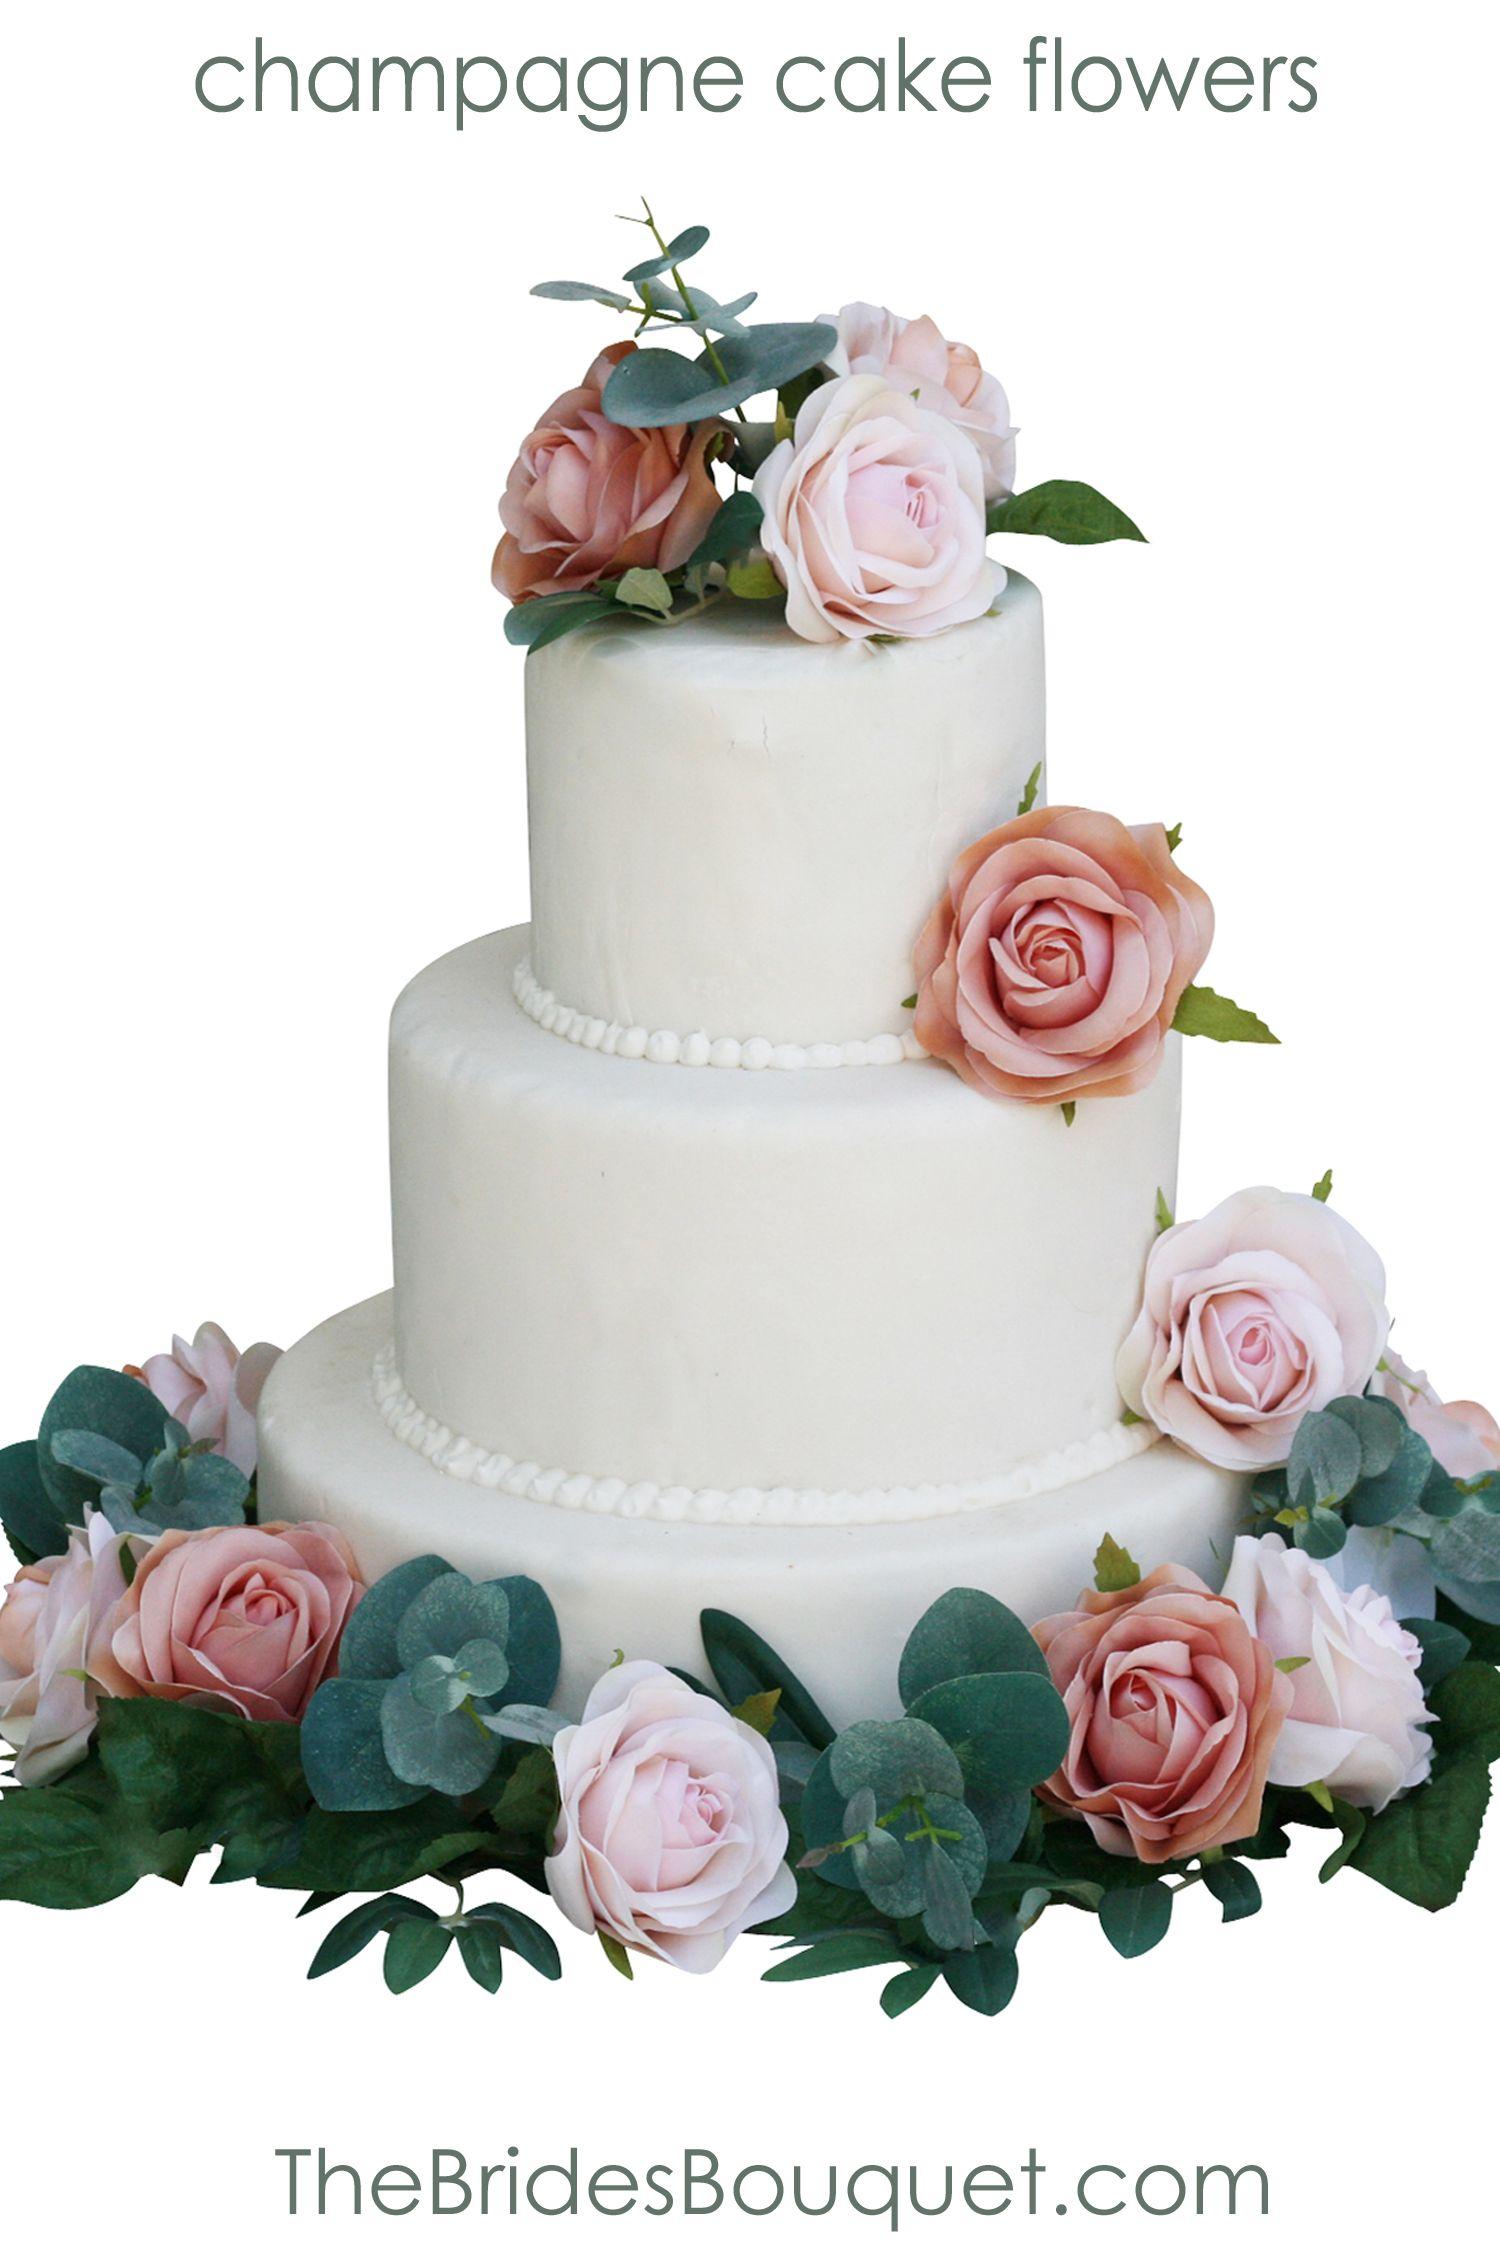 Champagne Taupe Blush Wedding Cake Flowers Decorations